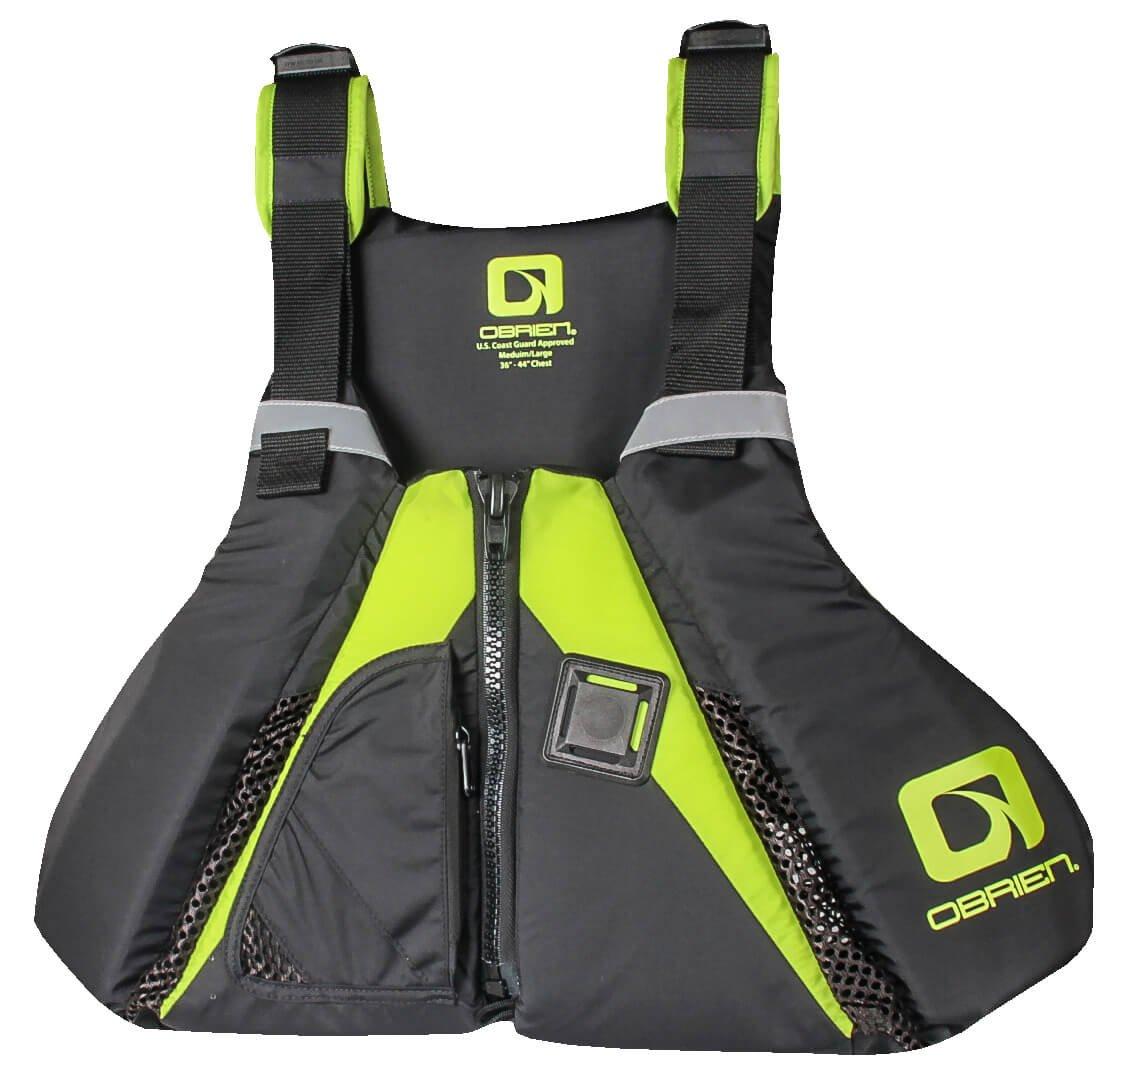 海外最新 Obrien XL/XXL Arsenal Stand Up Paddleboard Vest XL Black/Green/XXL Black Arsenal/Green B01N7WSN4S, 元祖くず餅 船橋屋:79881f90 --- a0267596.xsph.ru